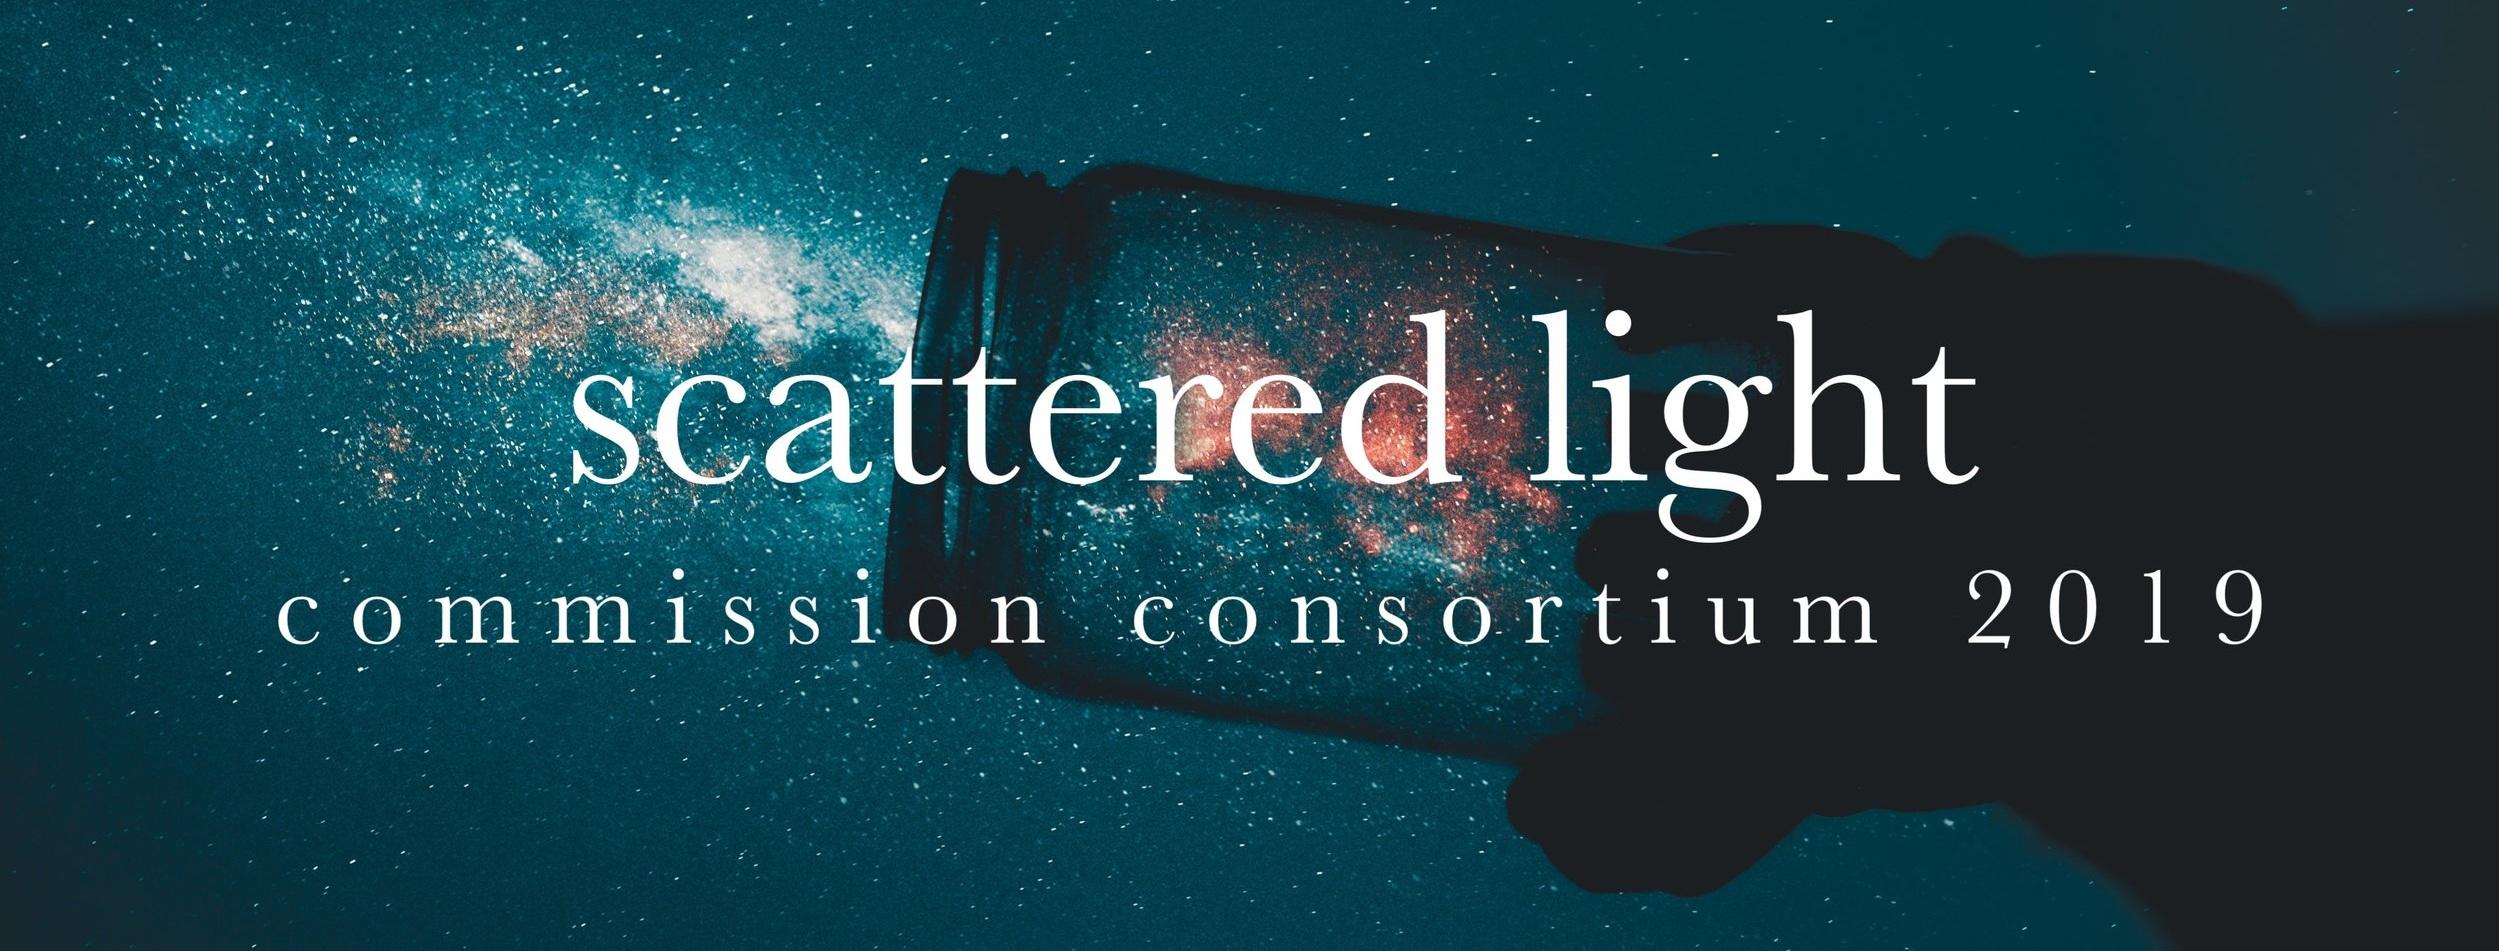 action-astronomy-constellation-1274260+%281%29.jpg